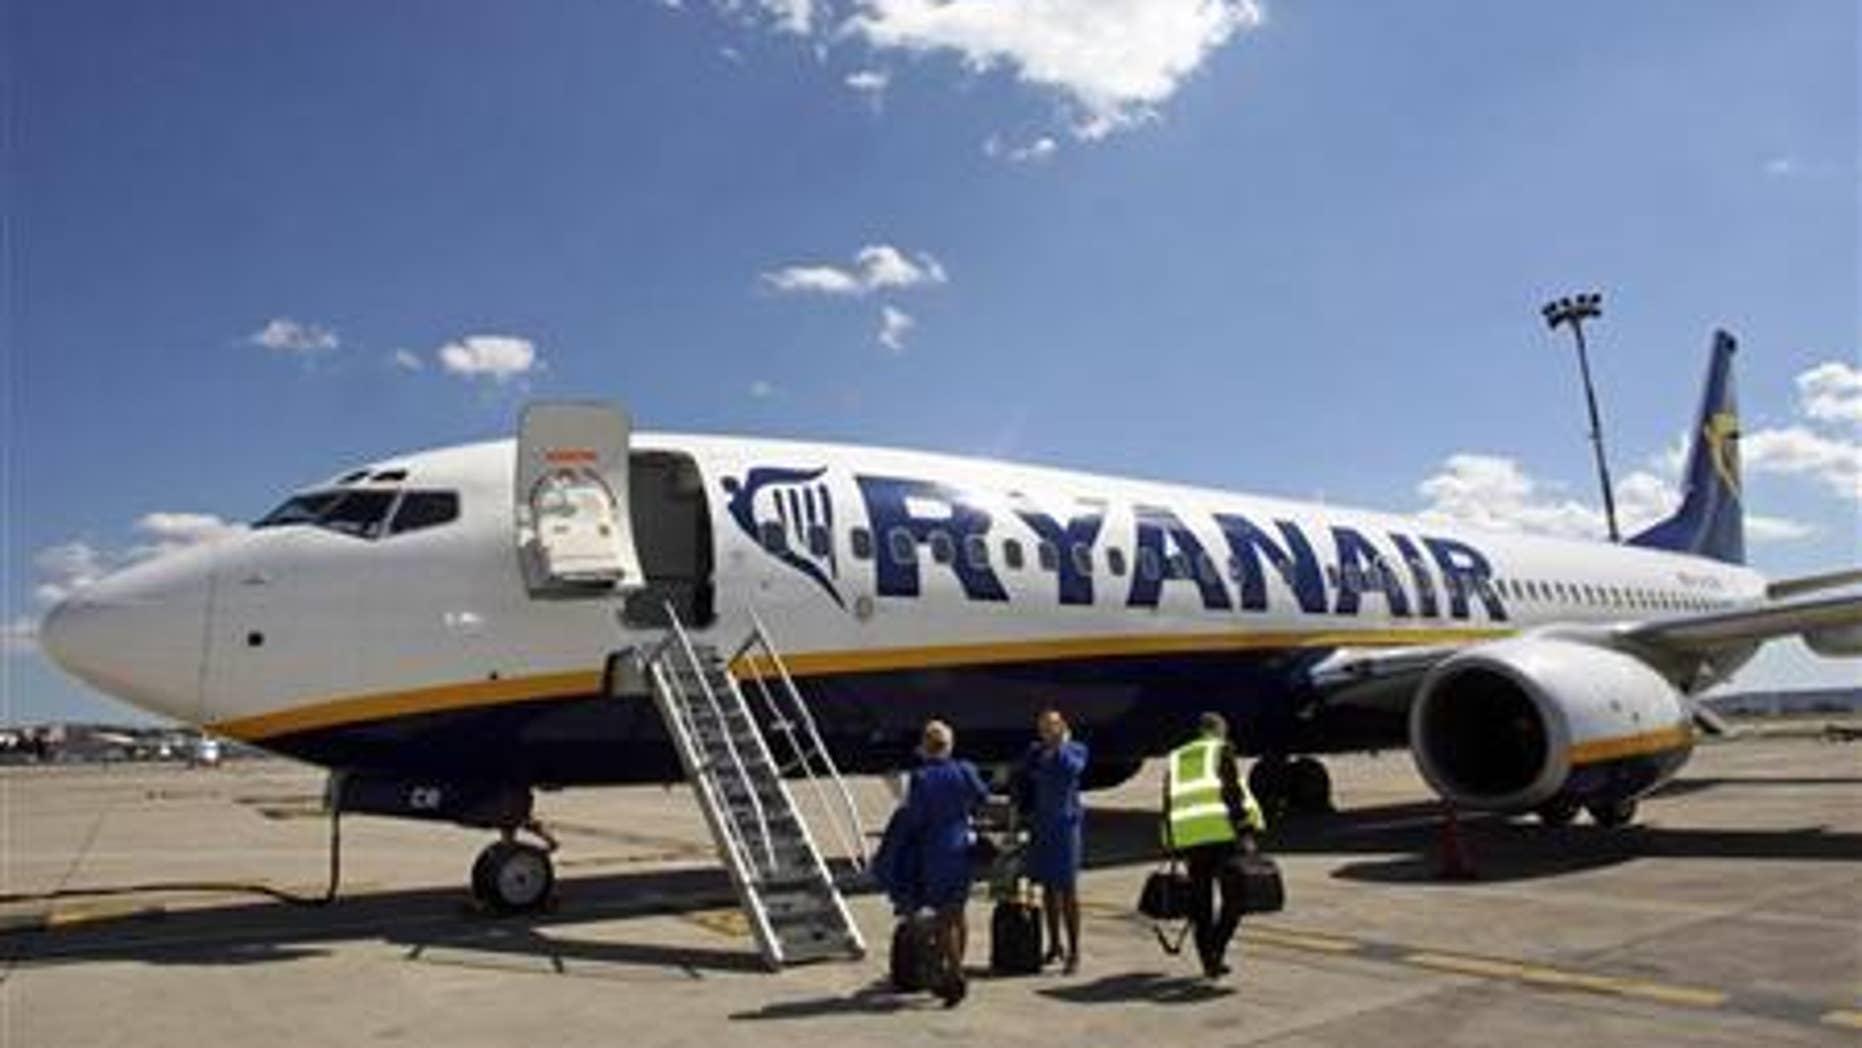 Ryanair crew board an aircraft in France.